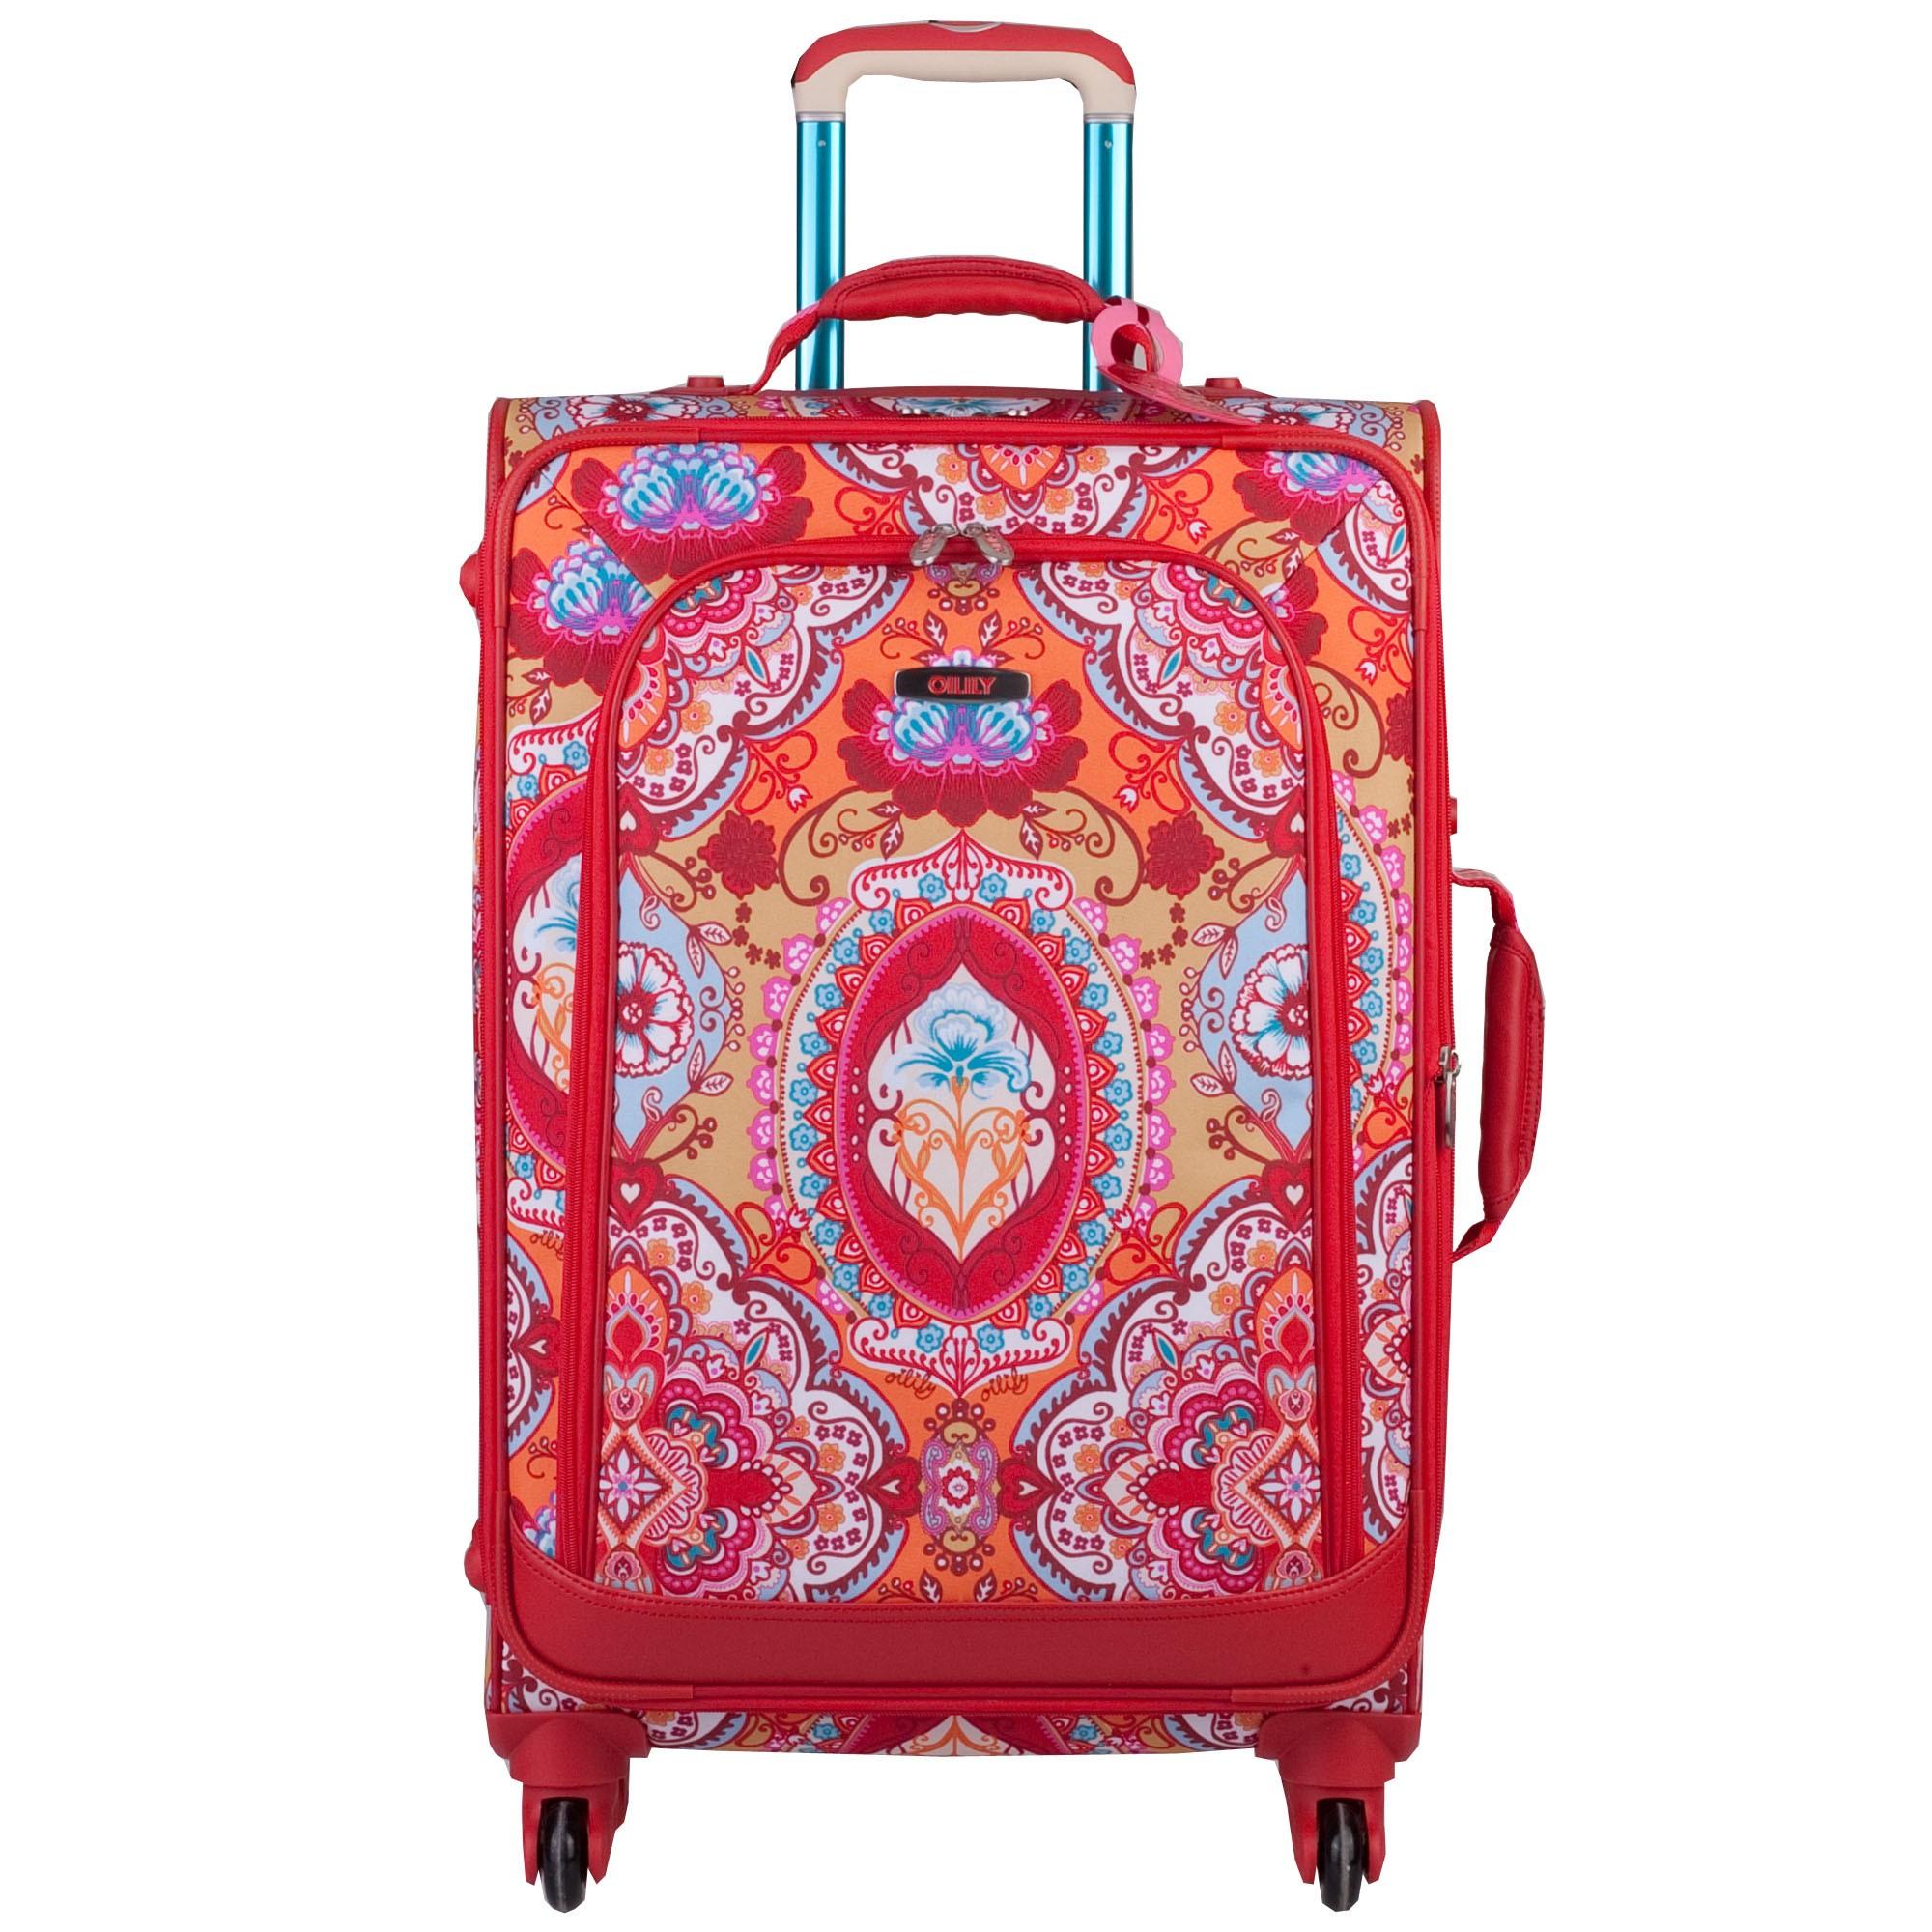 oilily travel 2013 lotus koffer m trolley 4 rollen erweiterbar 61 cm 64l ebay. Black Bedroom Furniture Sets. Home Design Ideas